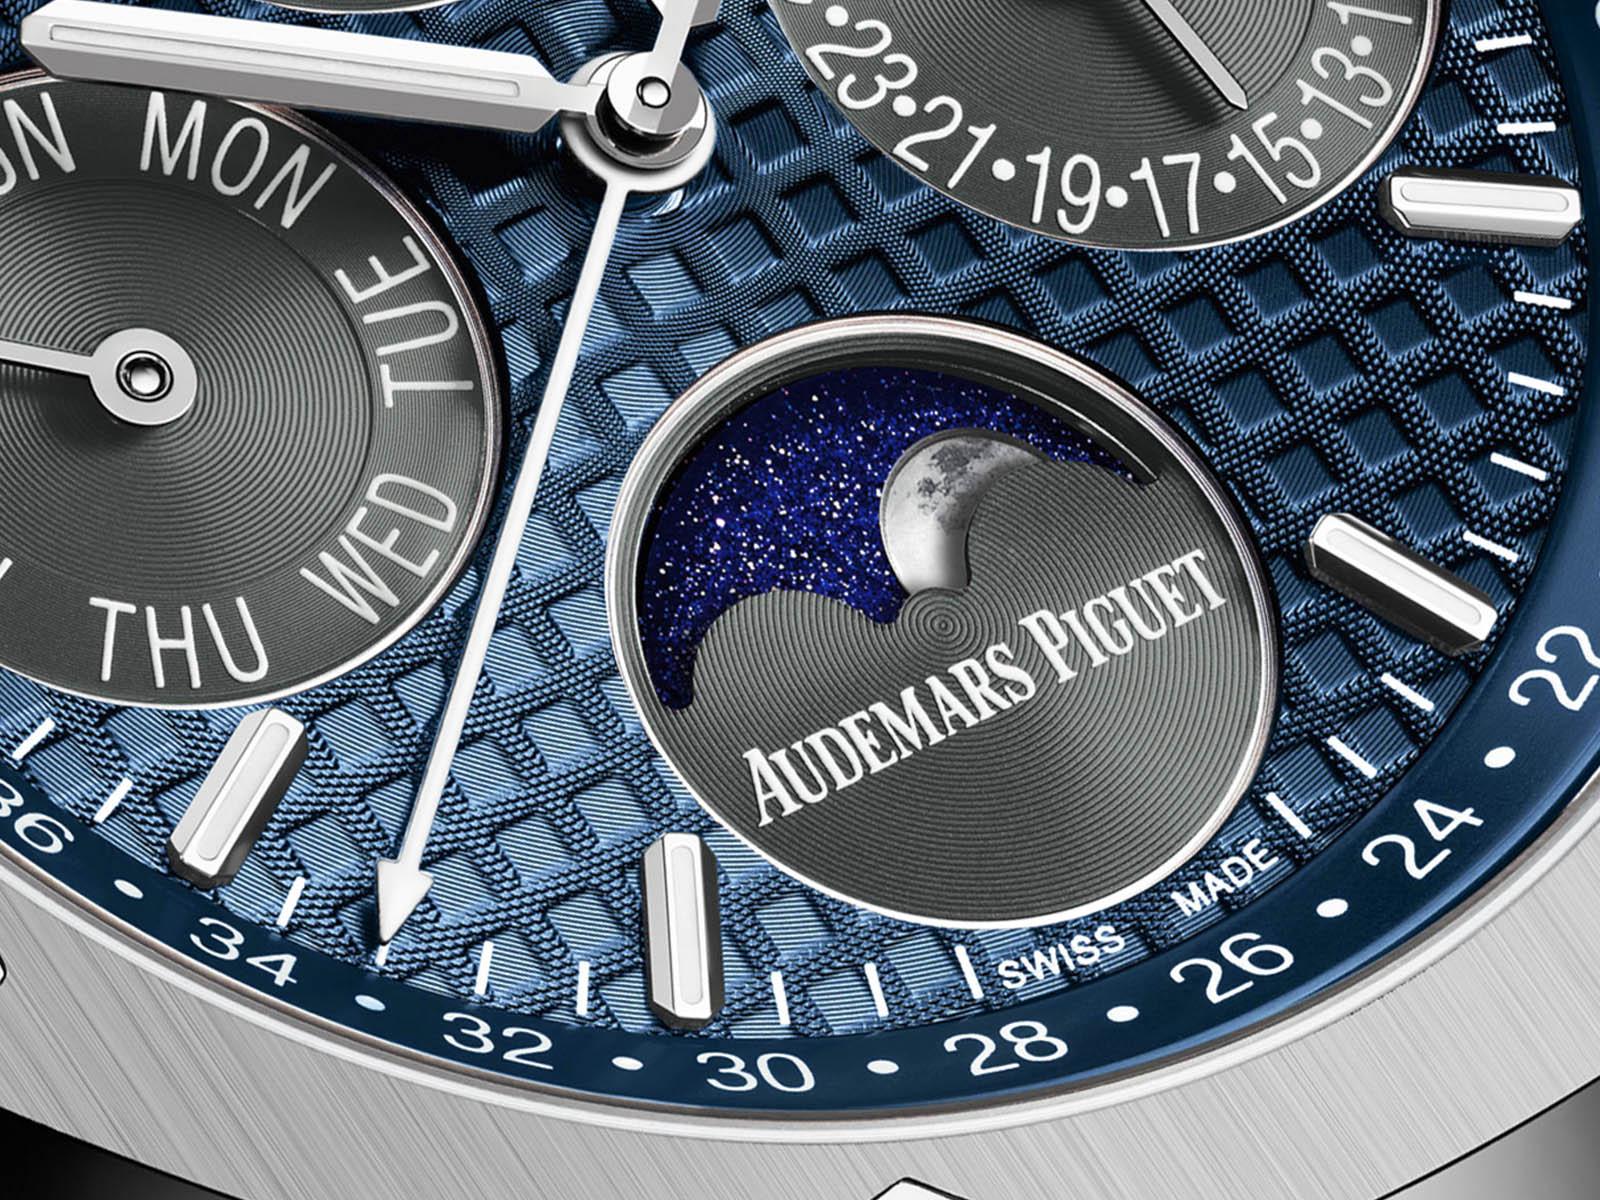 26574ti-oo-1220ti-01-audemars-piguet-royal-oak-perpetual-calendar-titanium-2.jpg